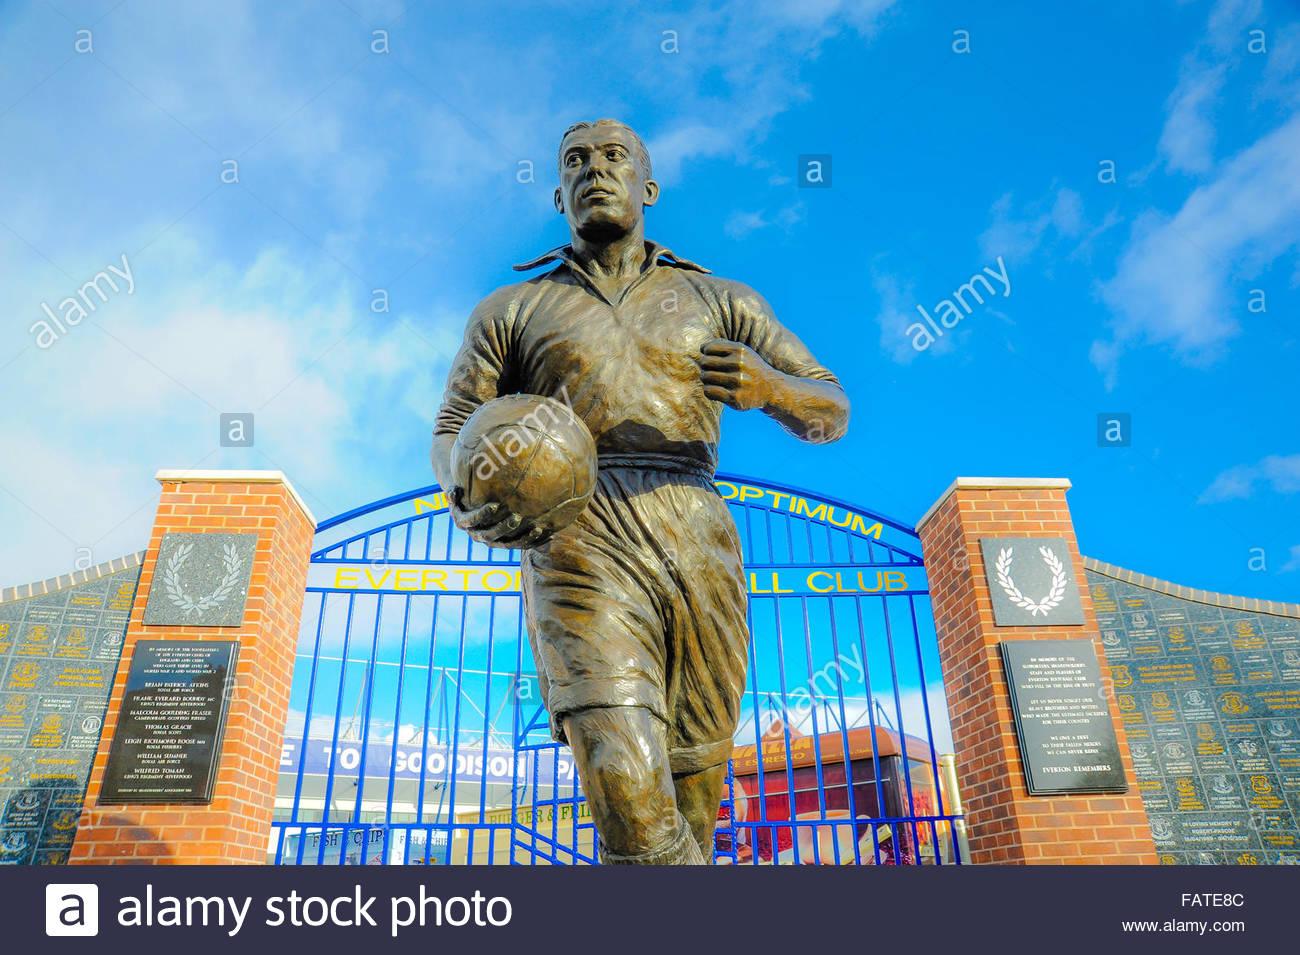 View of the statue of William Ralph (Dixie) Dean & EFC gates, Everton Football Club, outside Goodison Park, Walton, Stock Photo